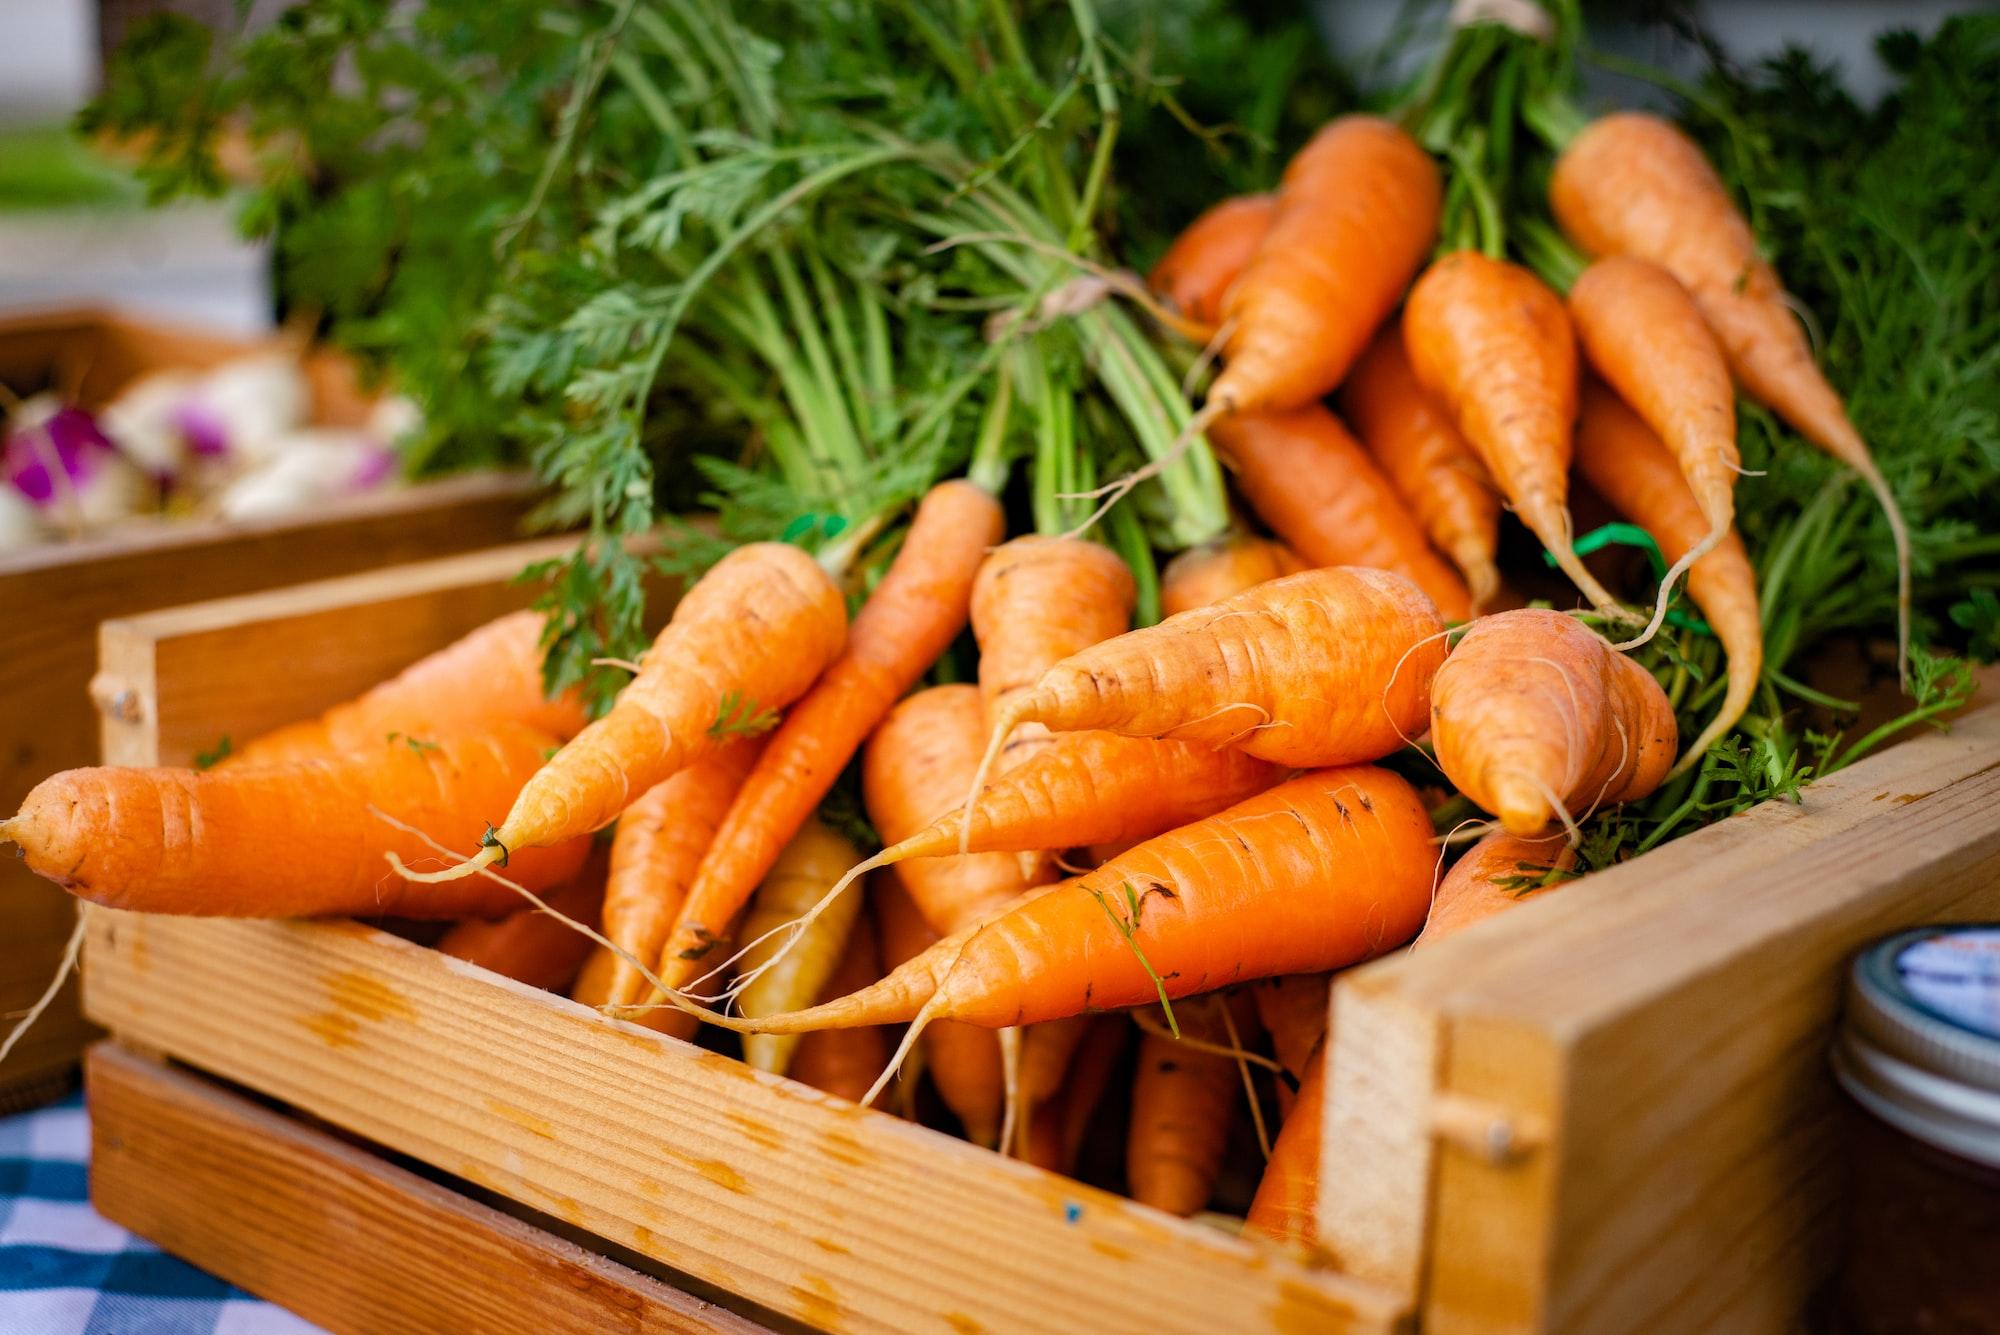 Bright orange carrots